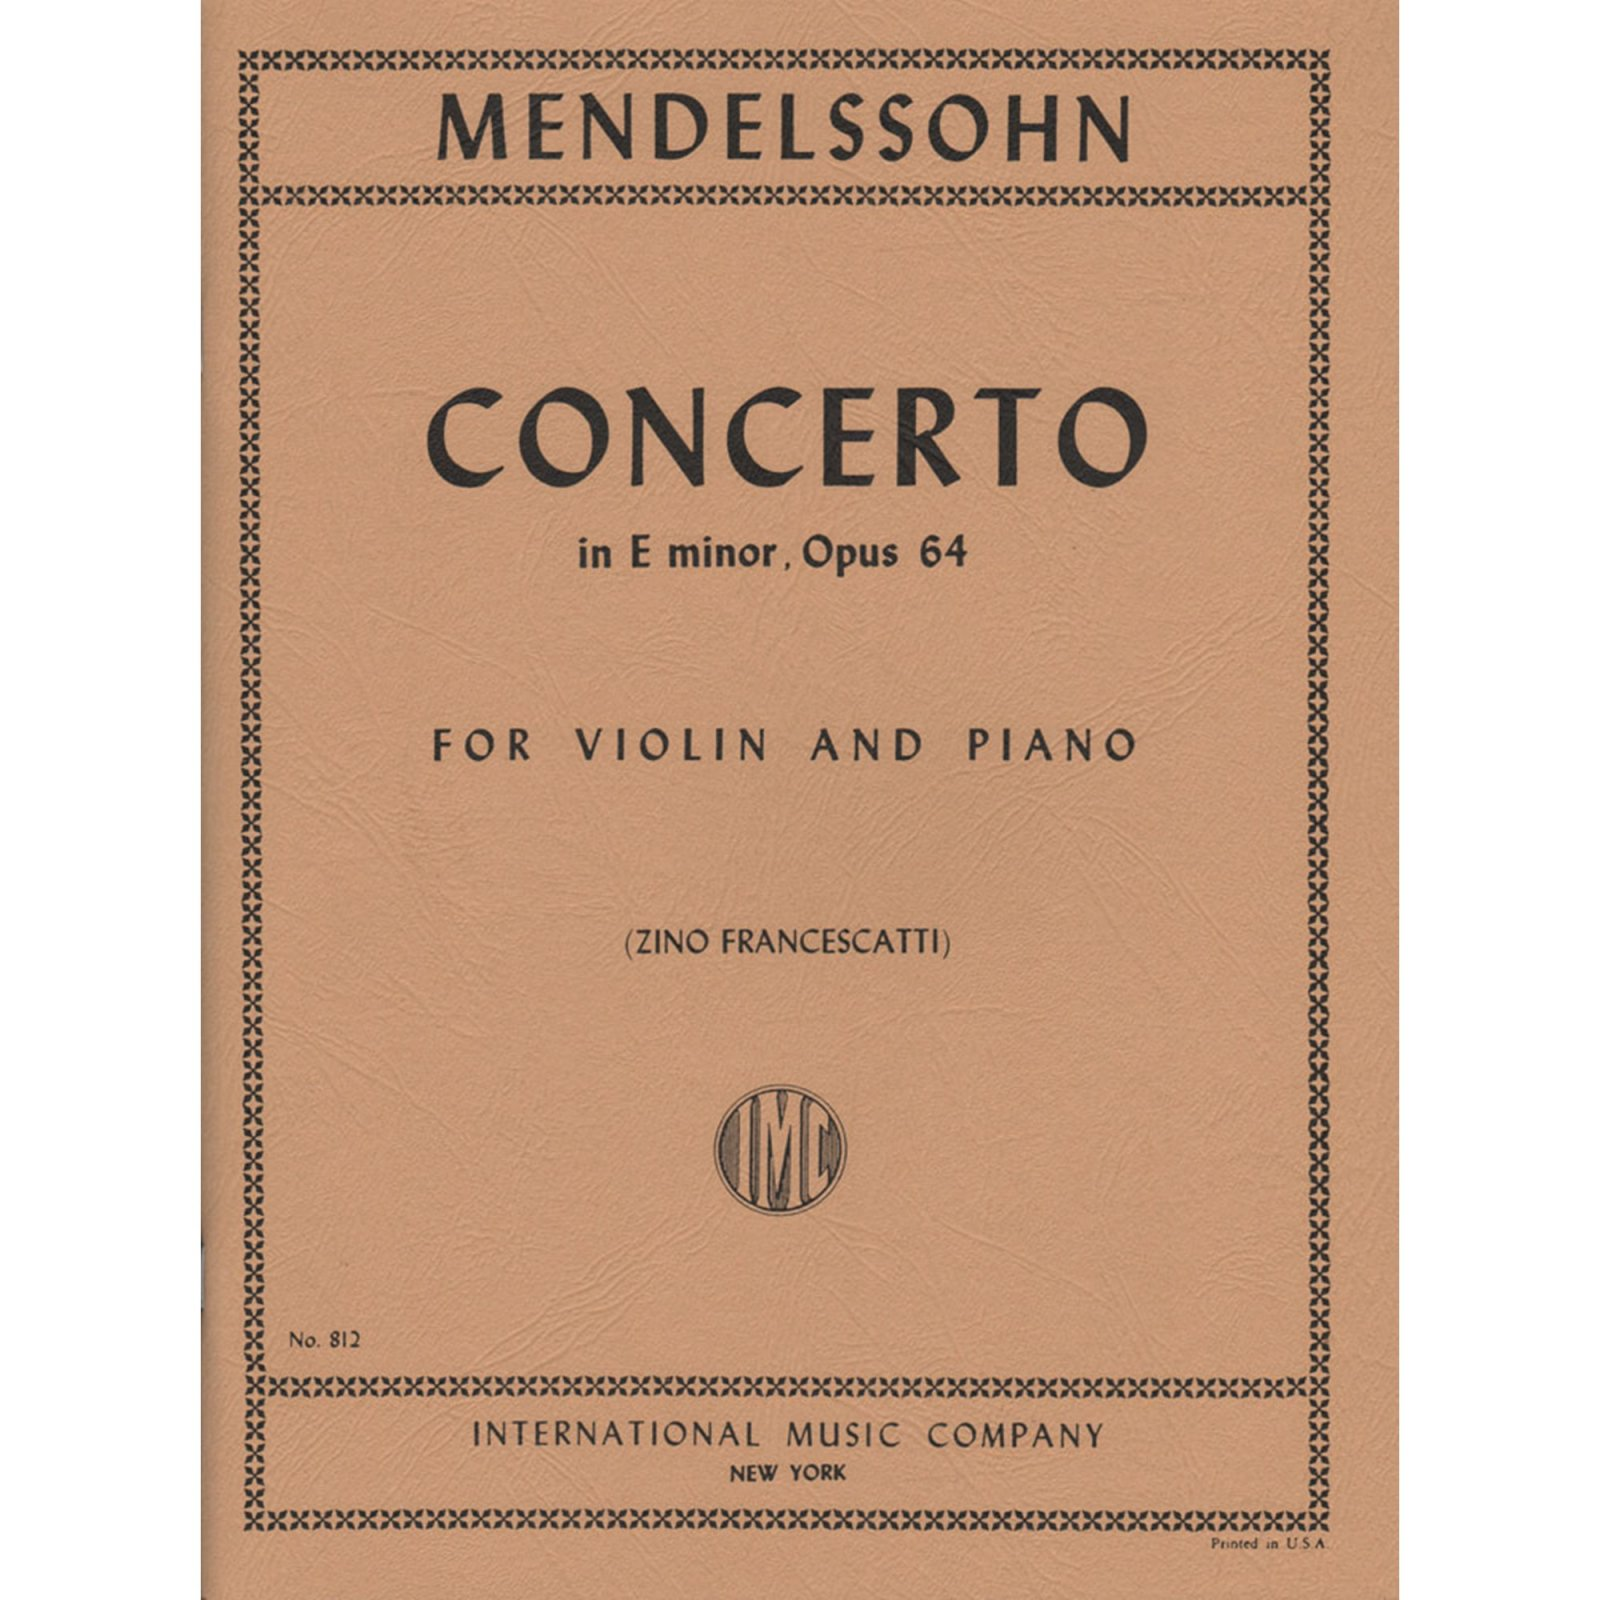 Mendelssohn: Concerto In E minor Op. 64 Ed. Francescatti